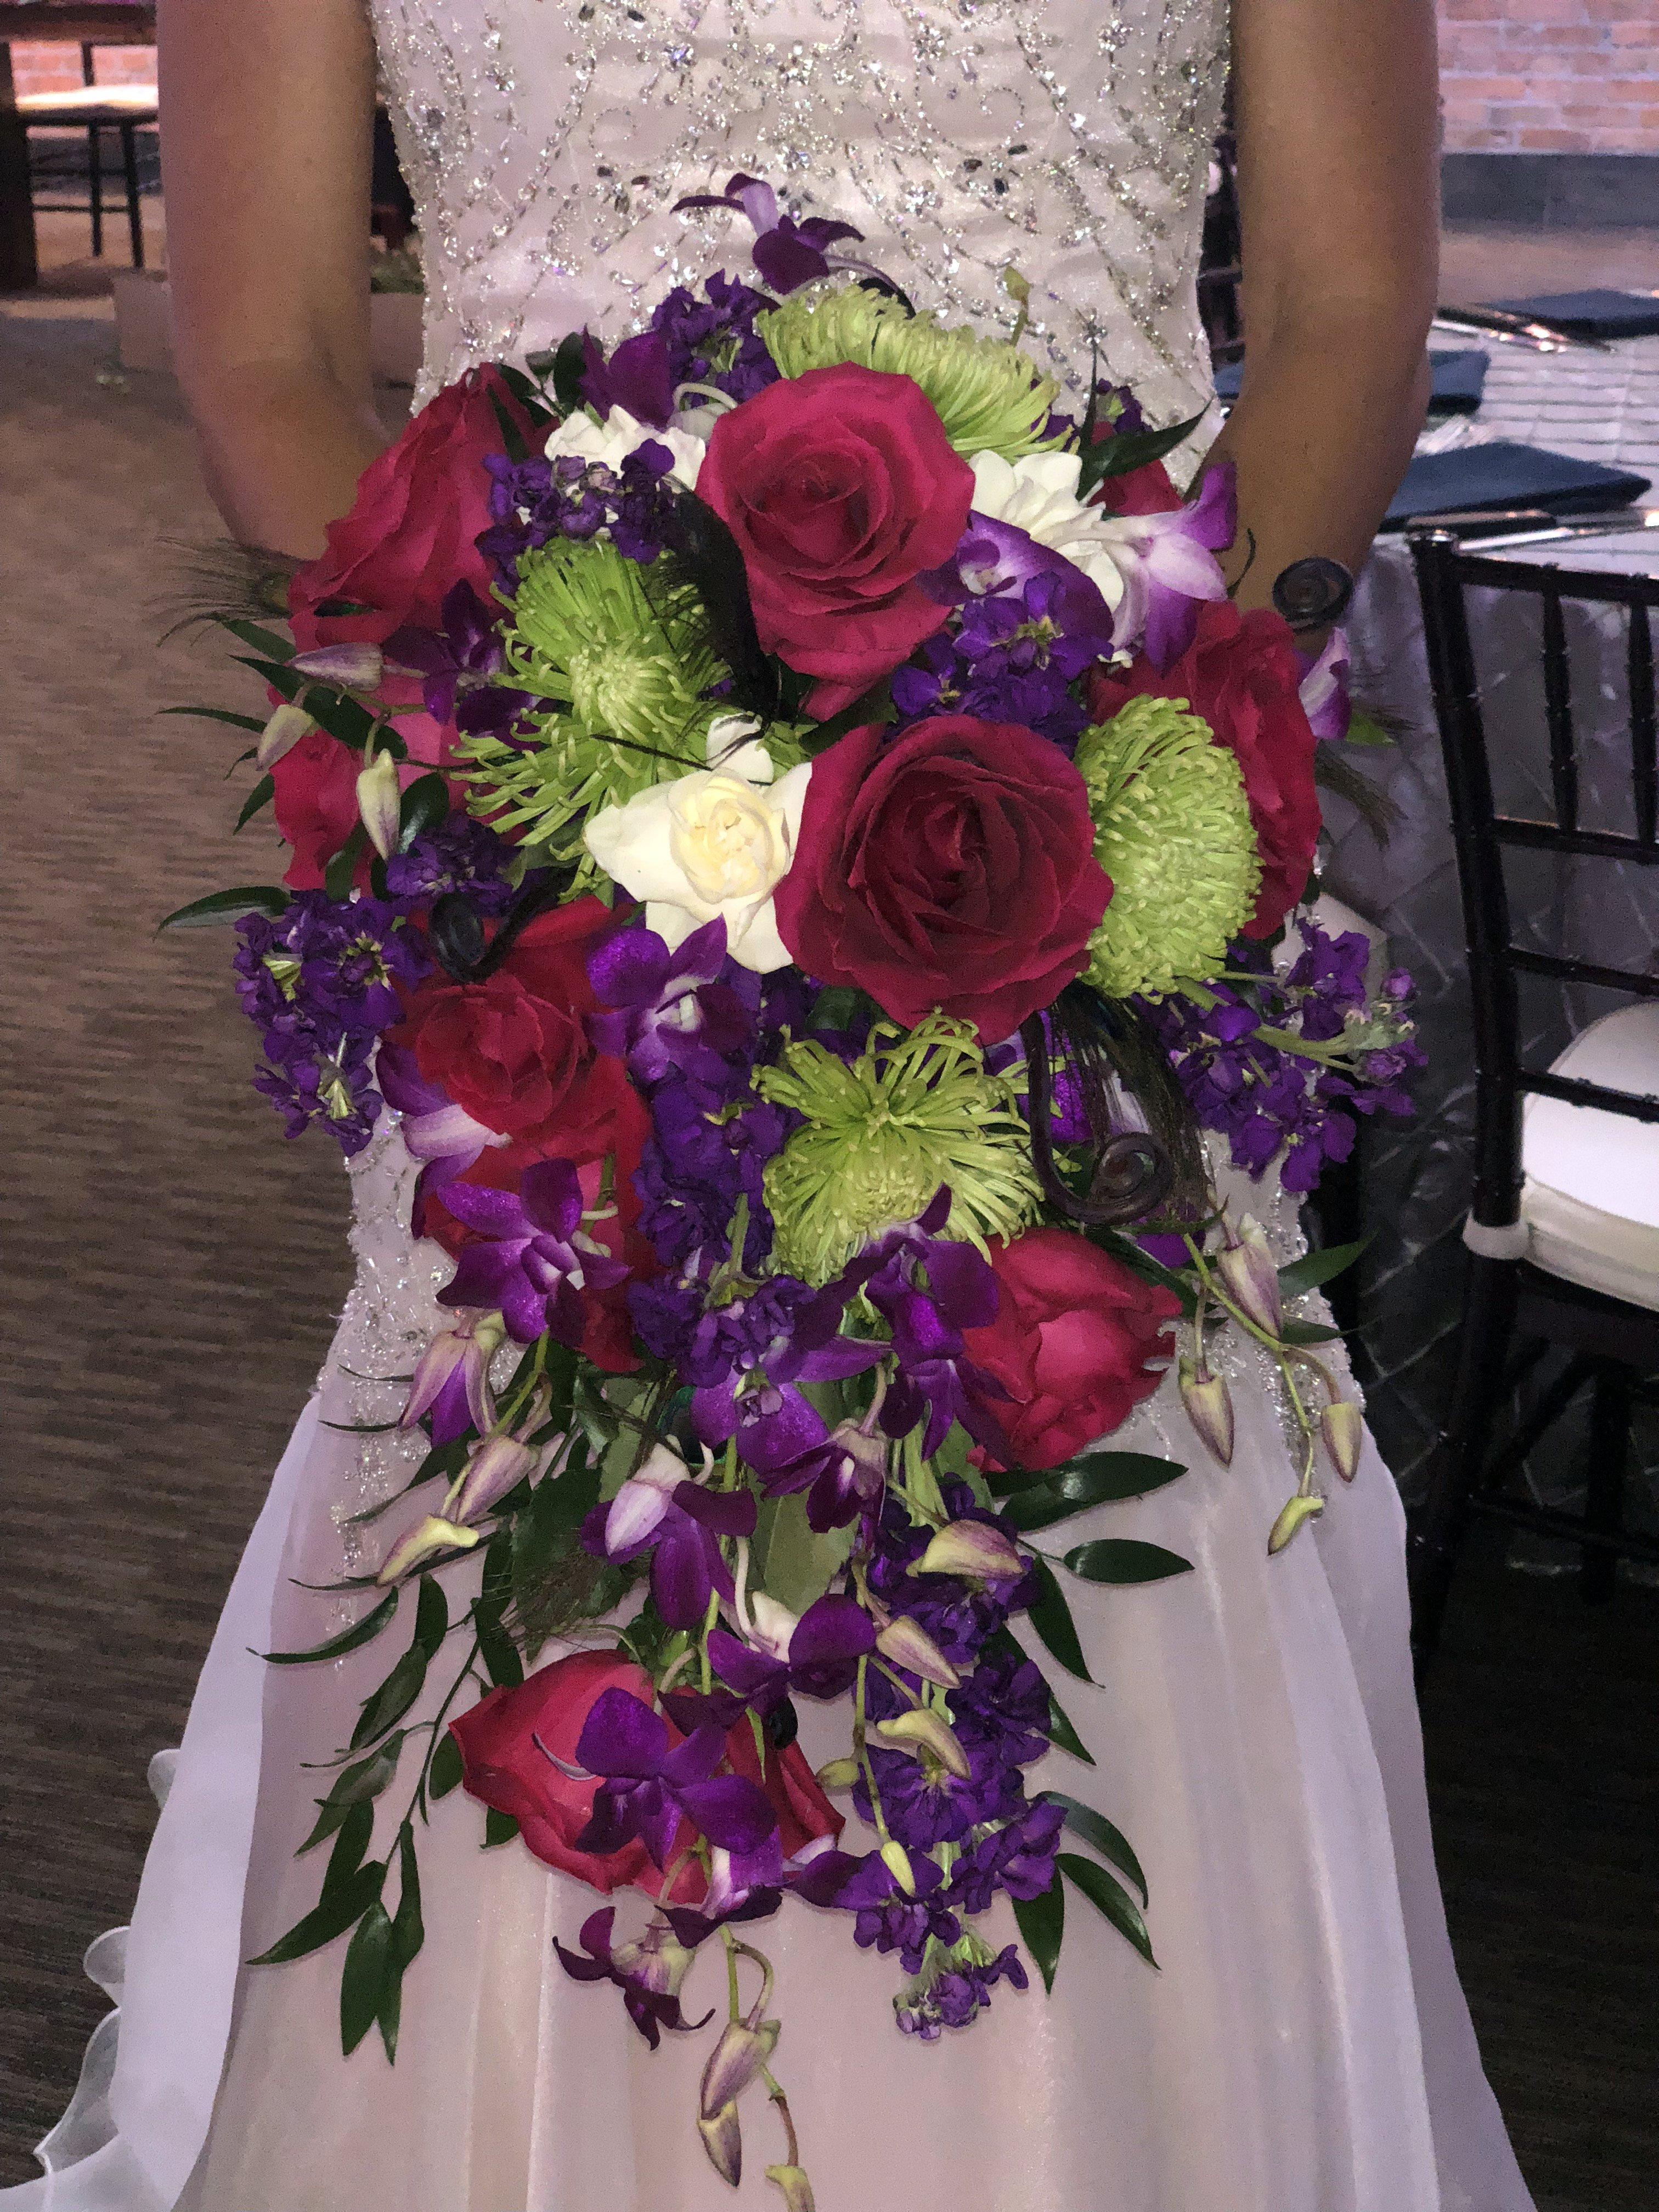 minneapolis event center wedding bridal bouquet